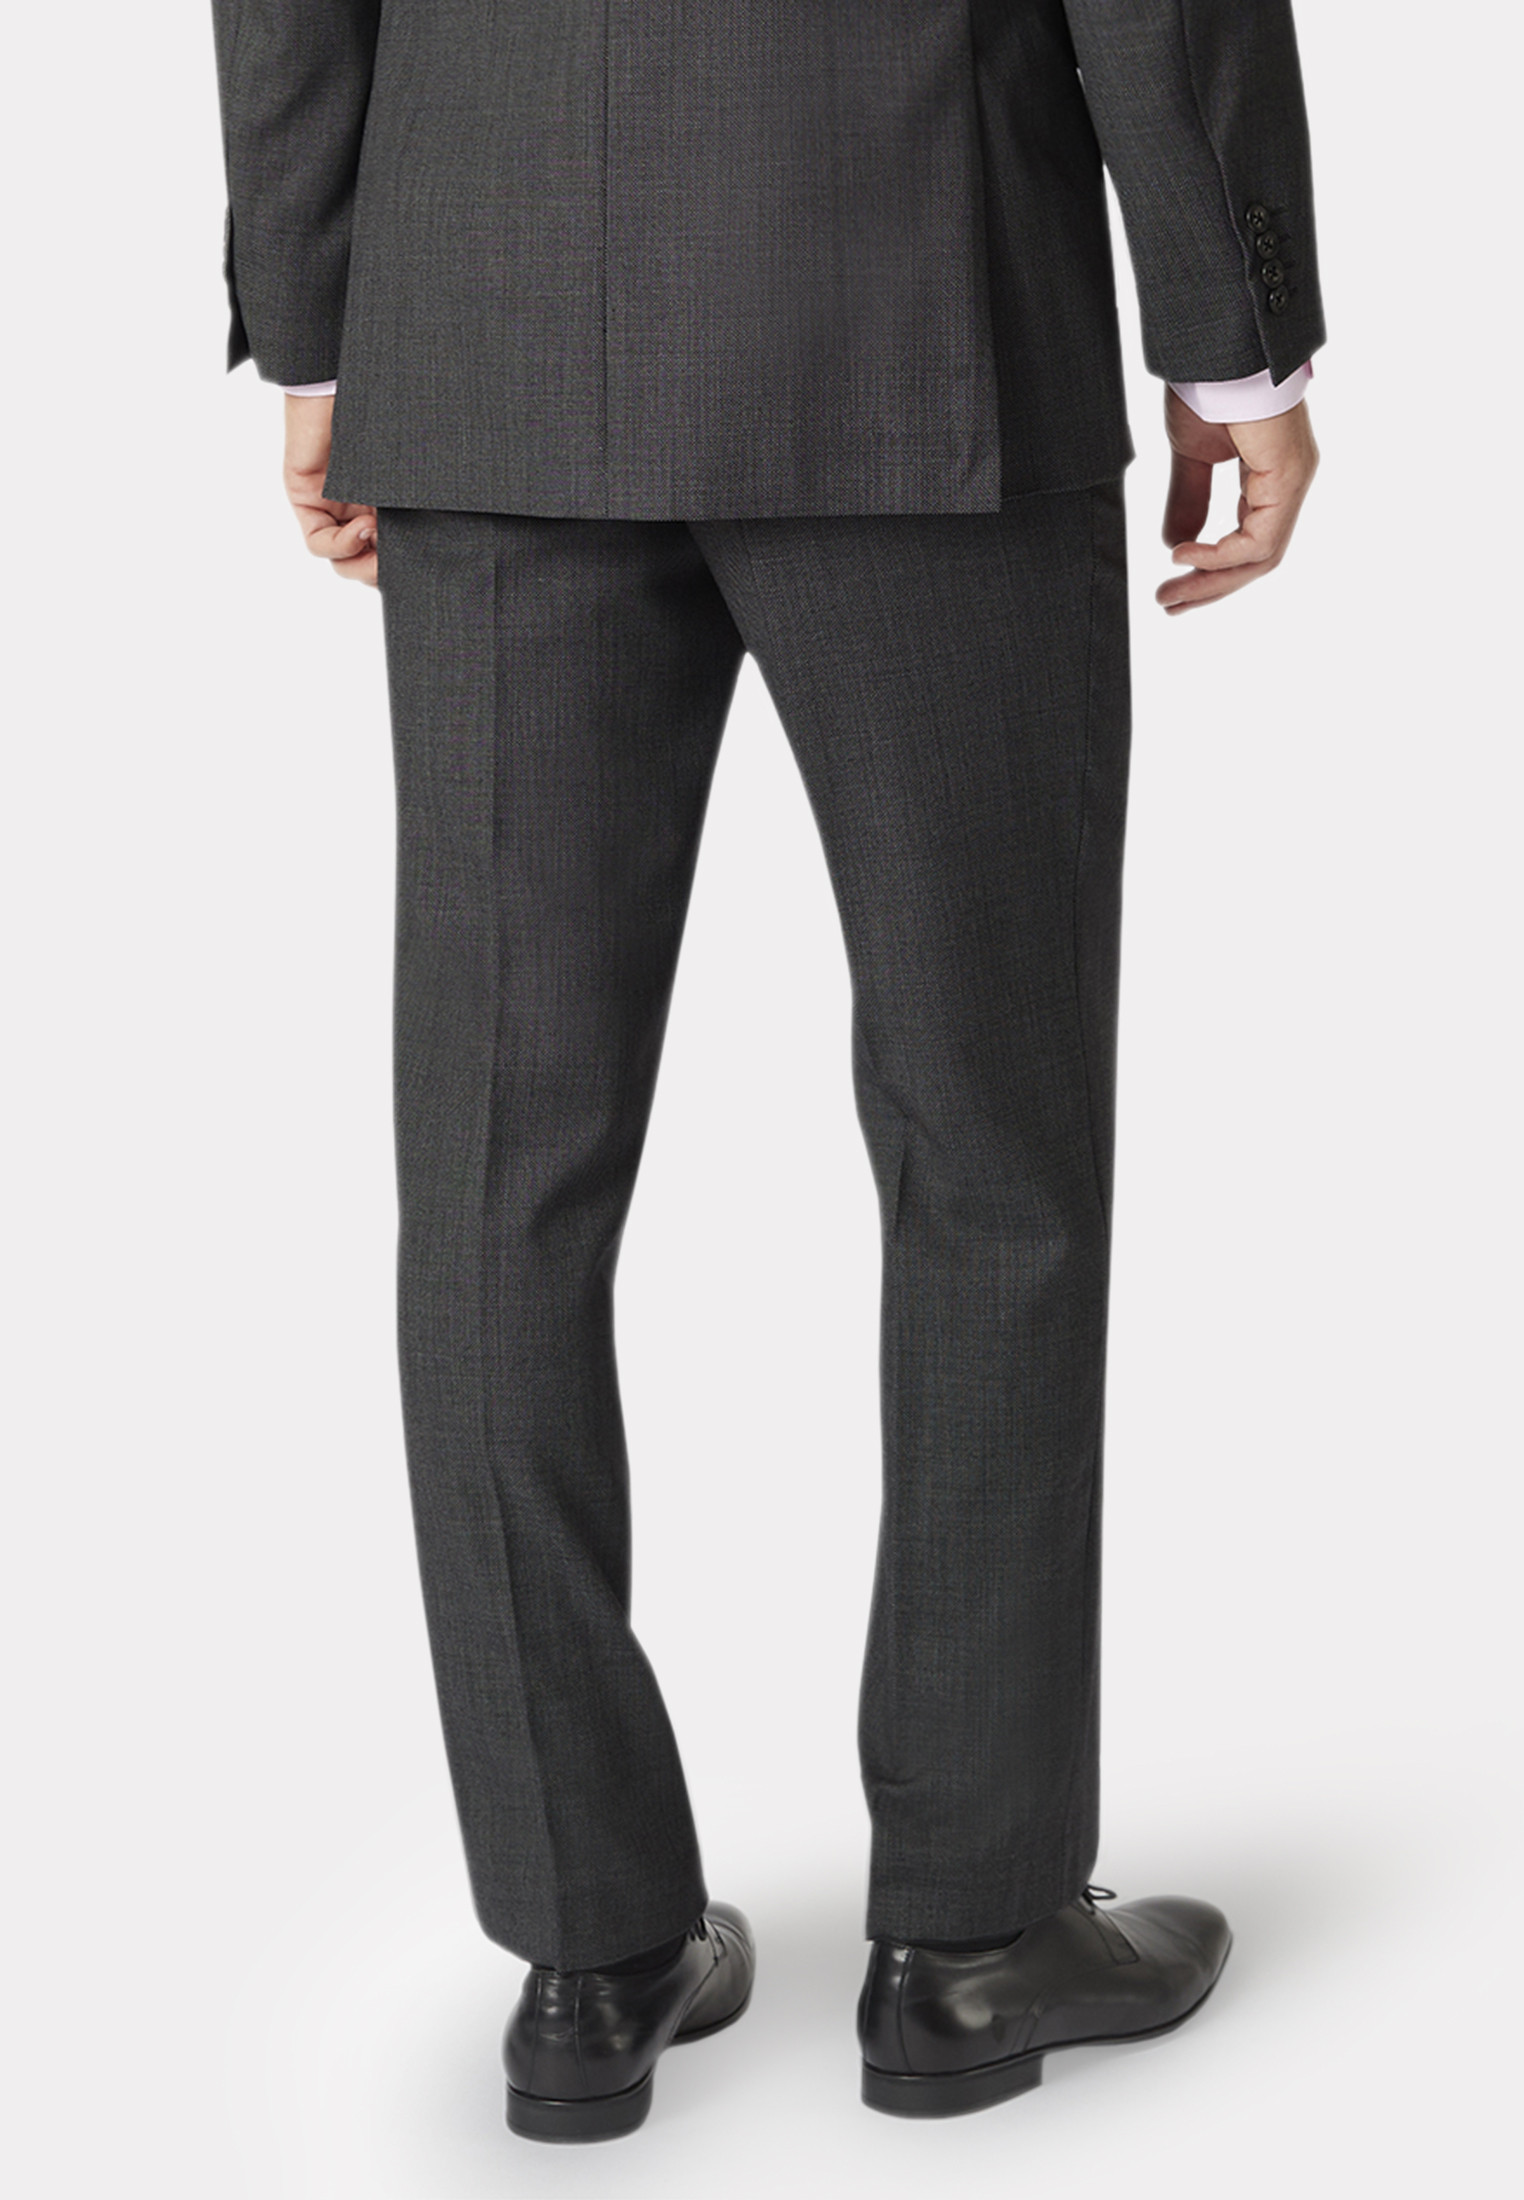 Dawlish Charcoal Birdseye Super 110's Suit